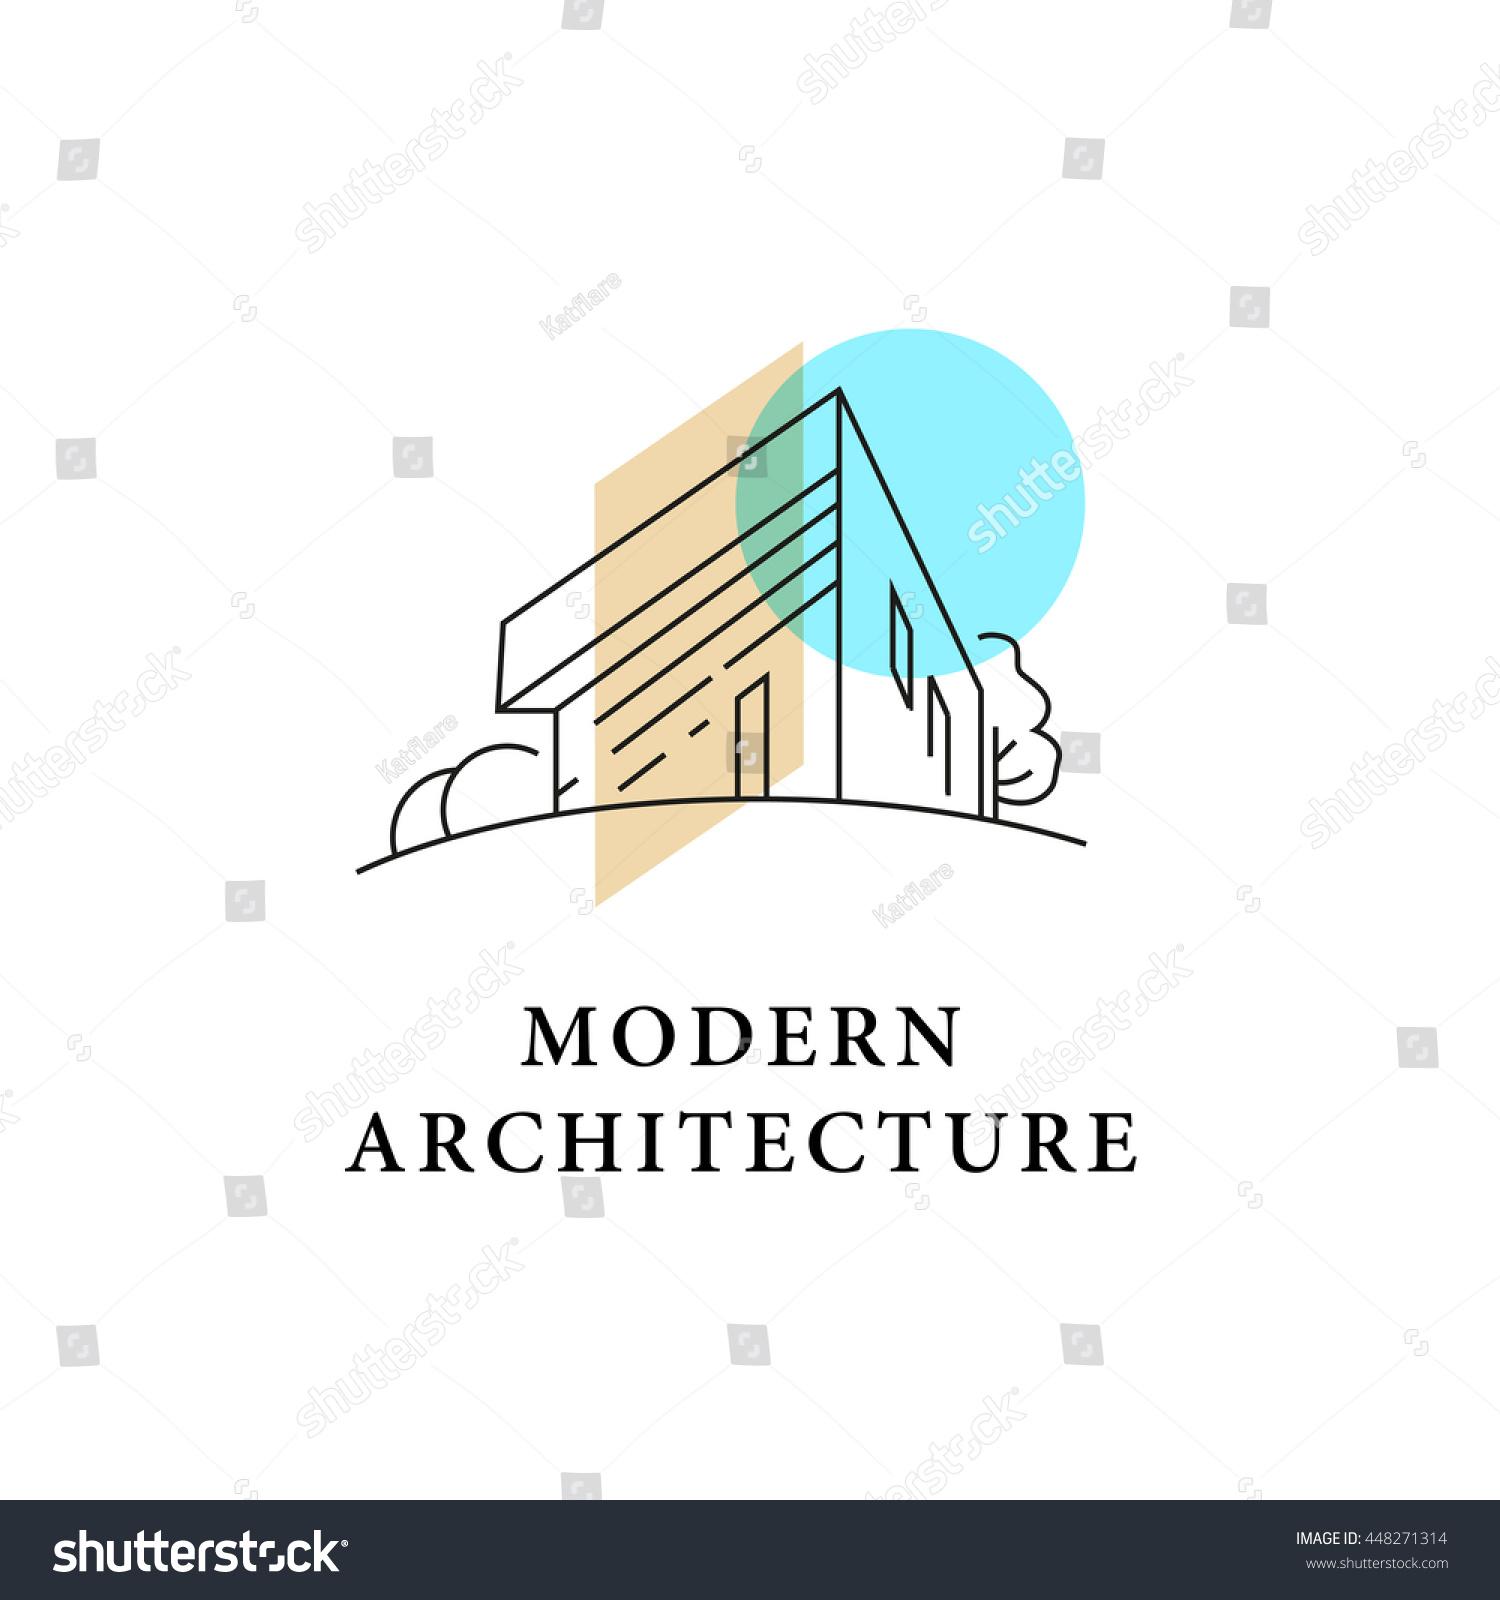 vector architect studio logo design isolated stock vector vector architect studio logo design isolated on white background architect bureau insignia icon home